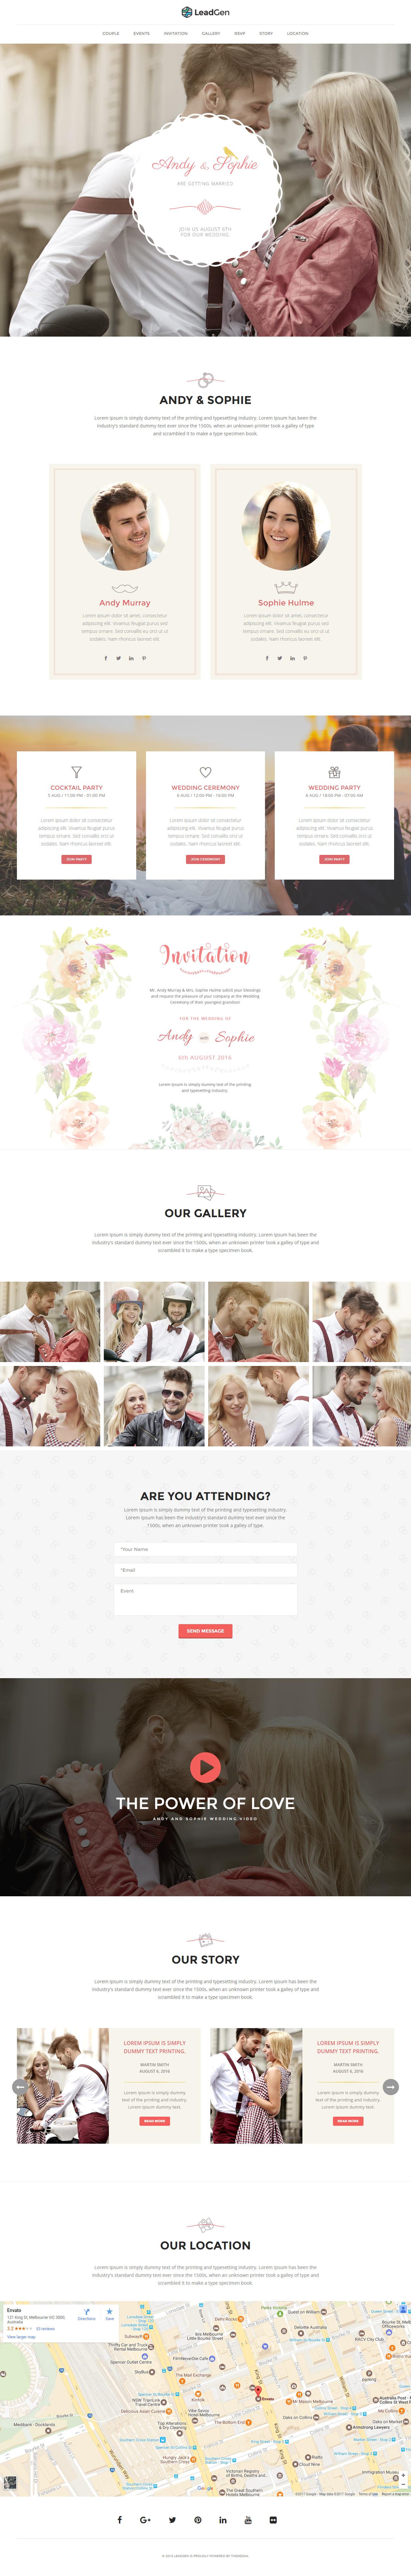 3+ Best Responsive HTML3 Wedding Templates 3 - Responsive Miracle